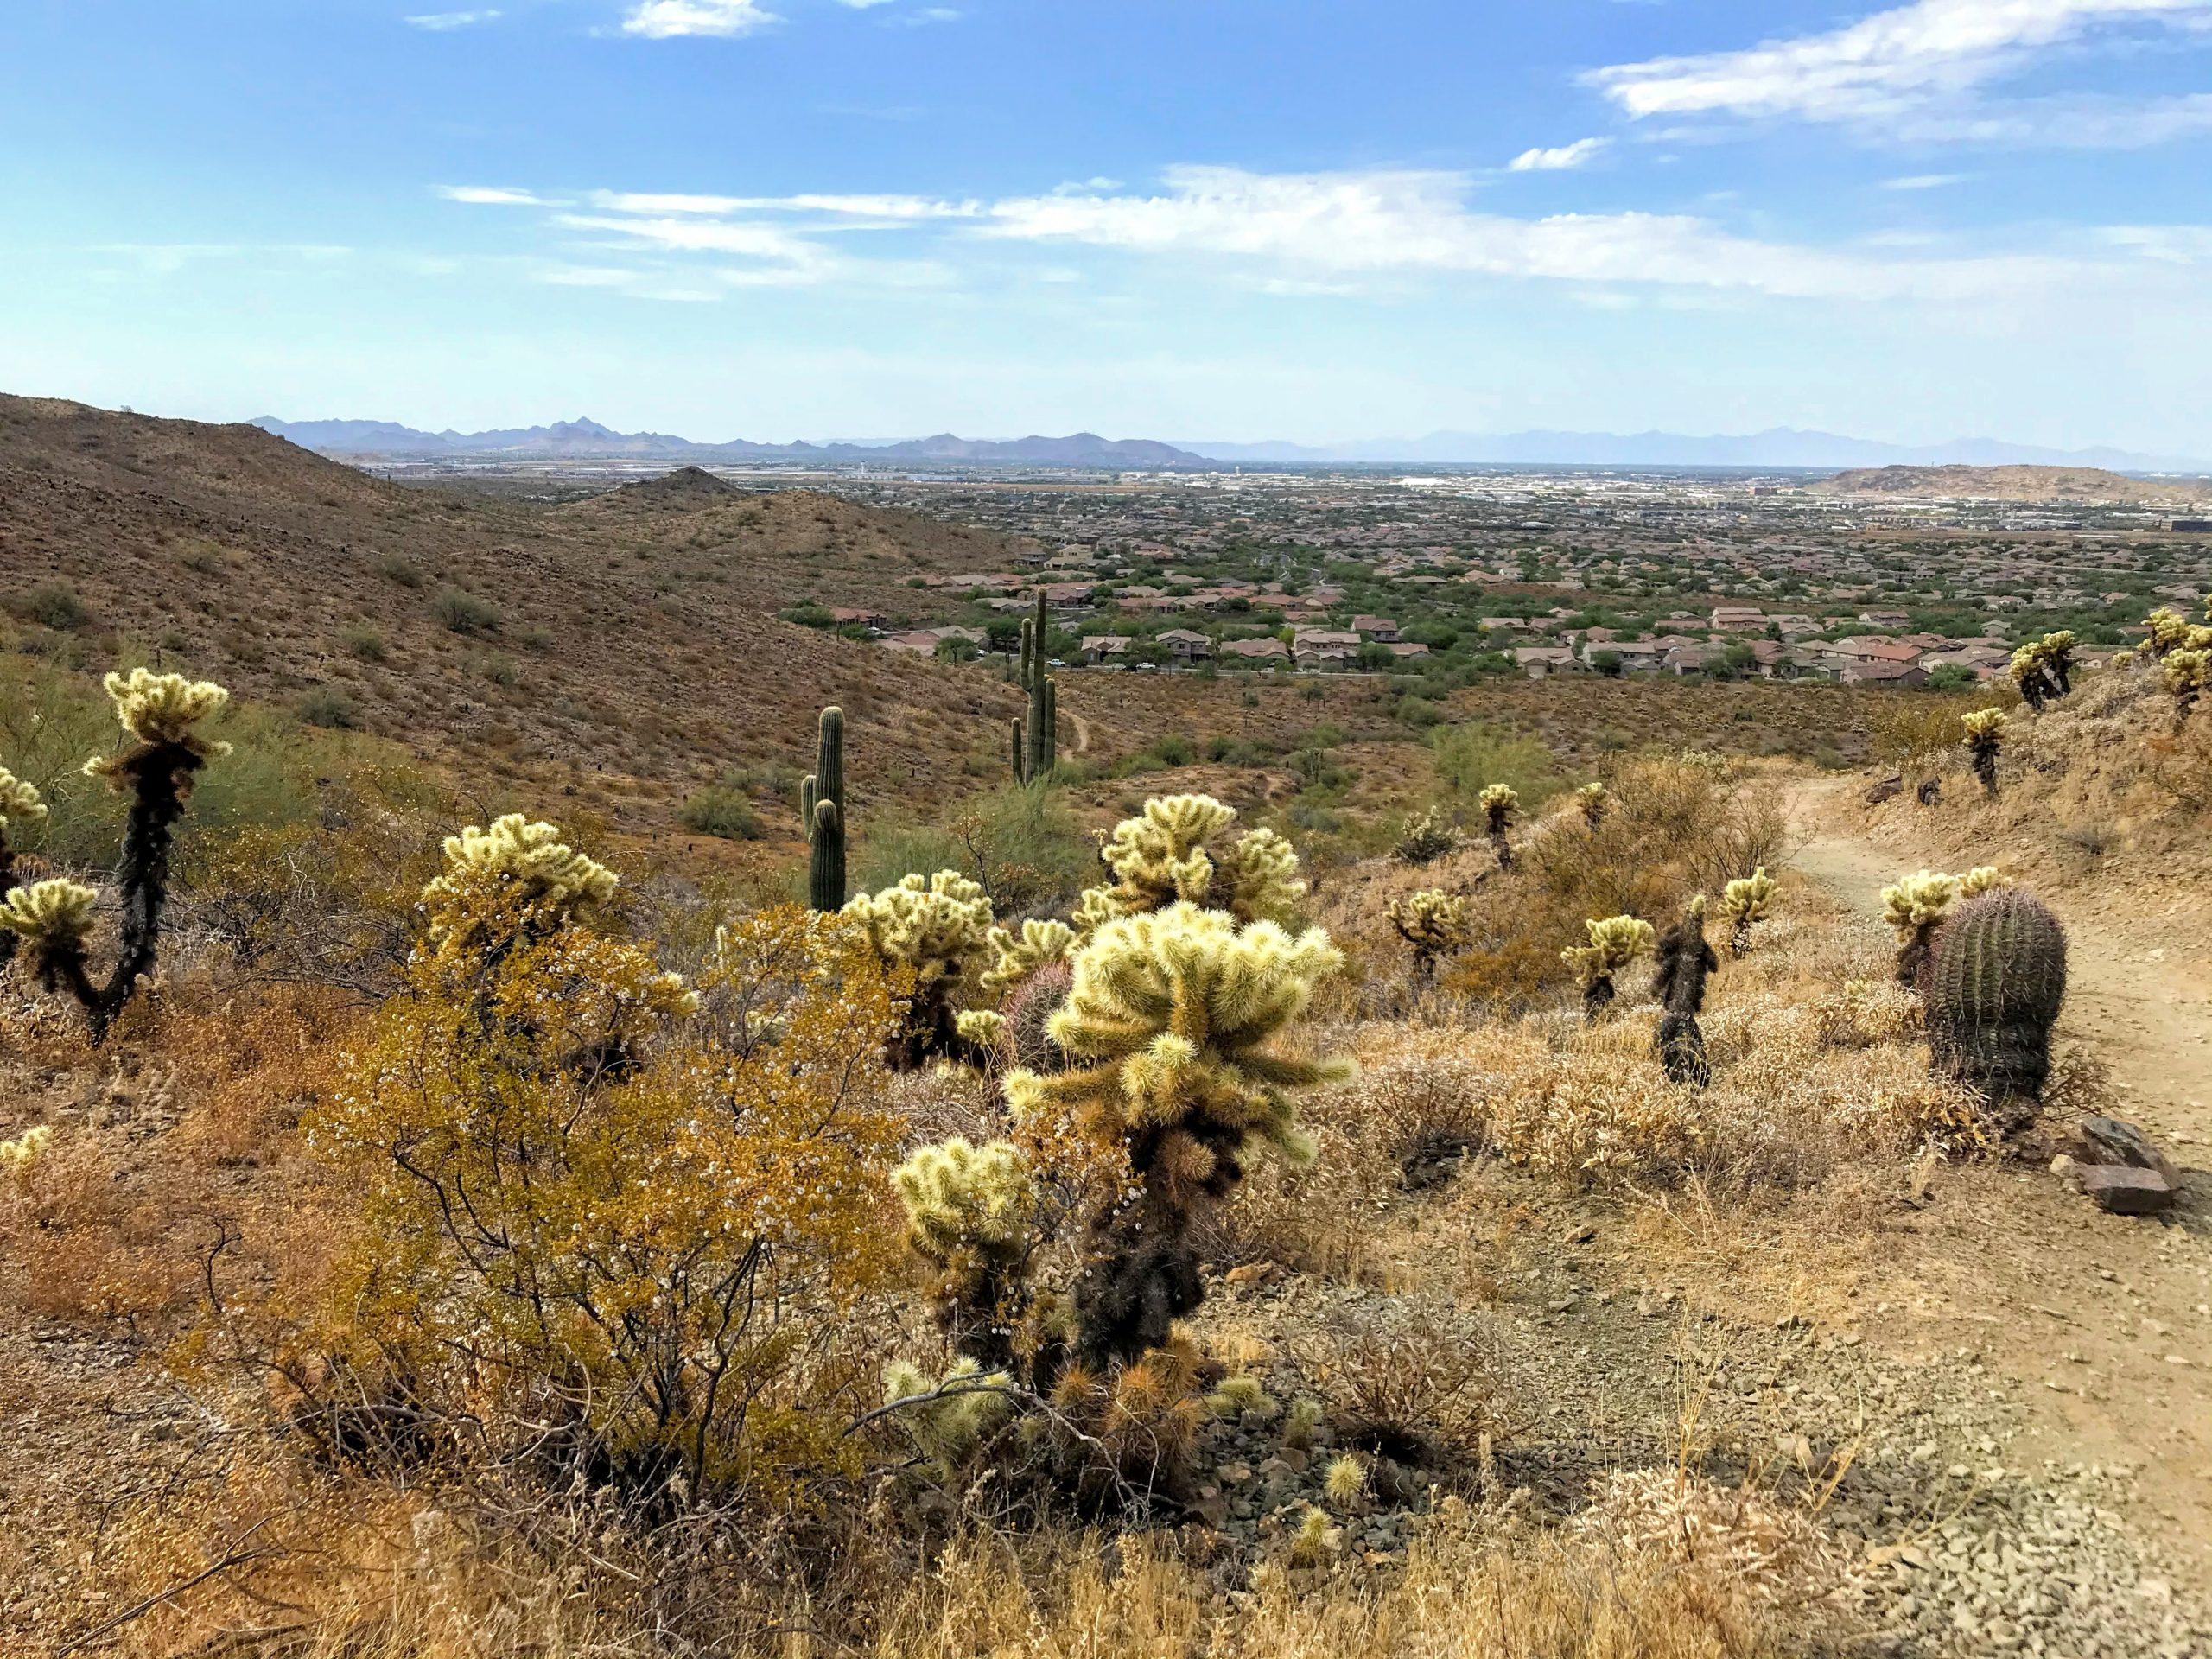 Desert Vista Trailhead Hikes, Phoenix Sonoran Preserve downtown views